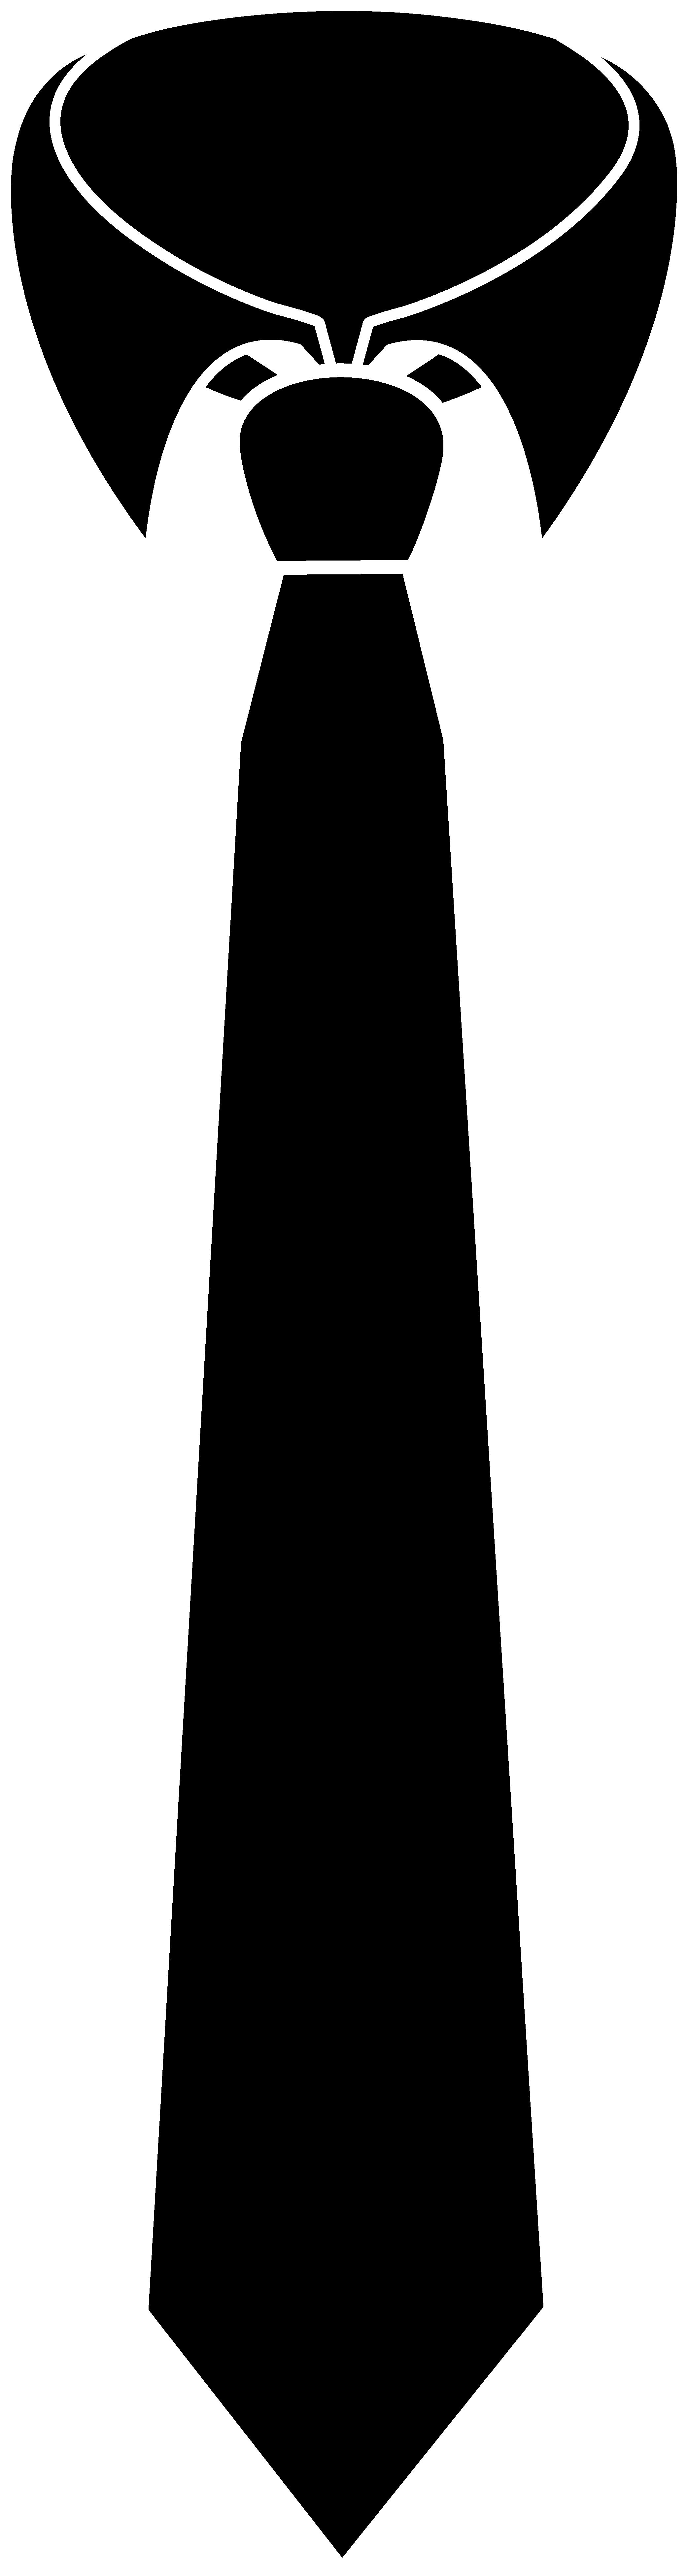 collar clipart - Clip Art Tie